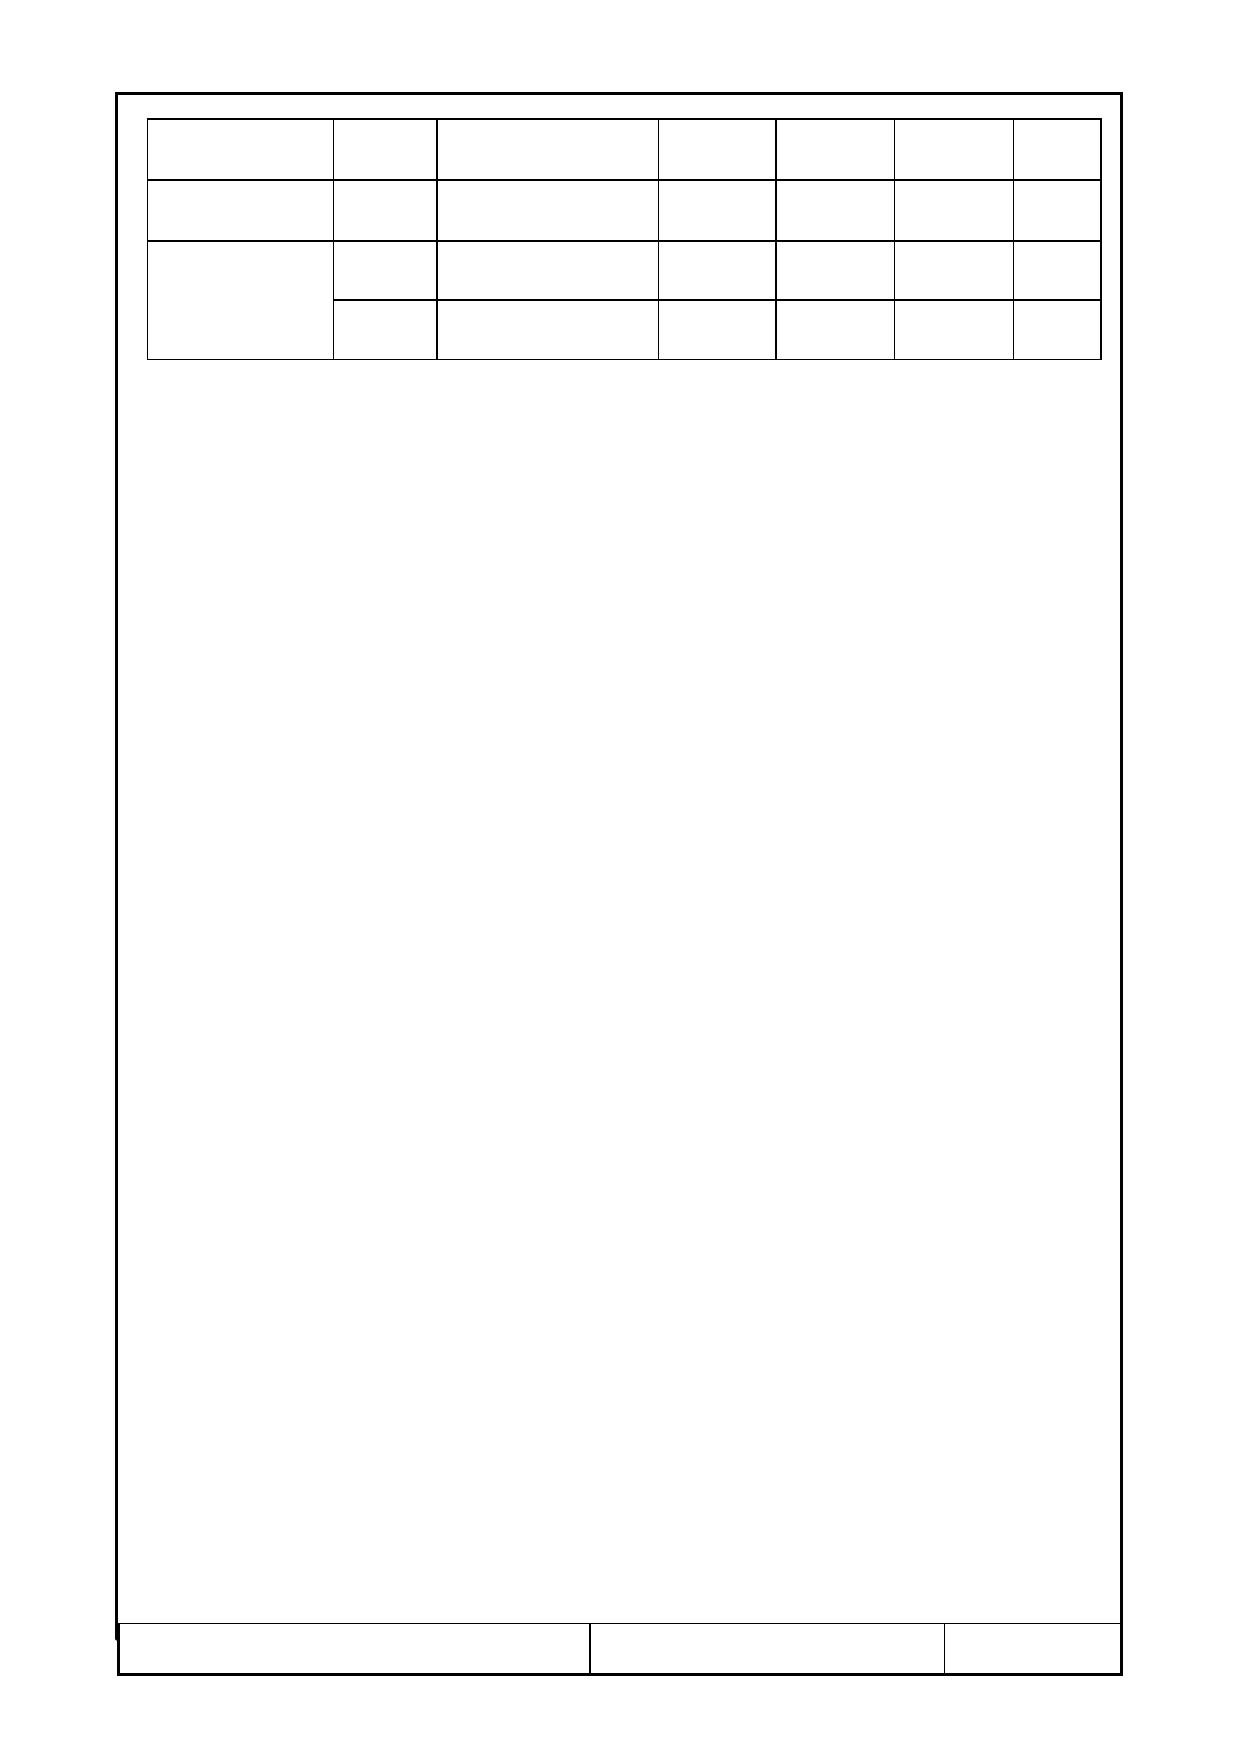 F-51851GNFQJ-LG-ACN pdf, 반도체, 판매, 대치품